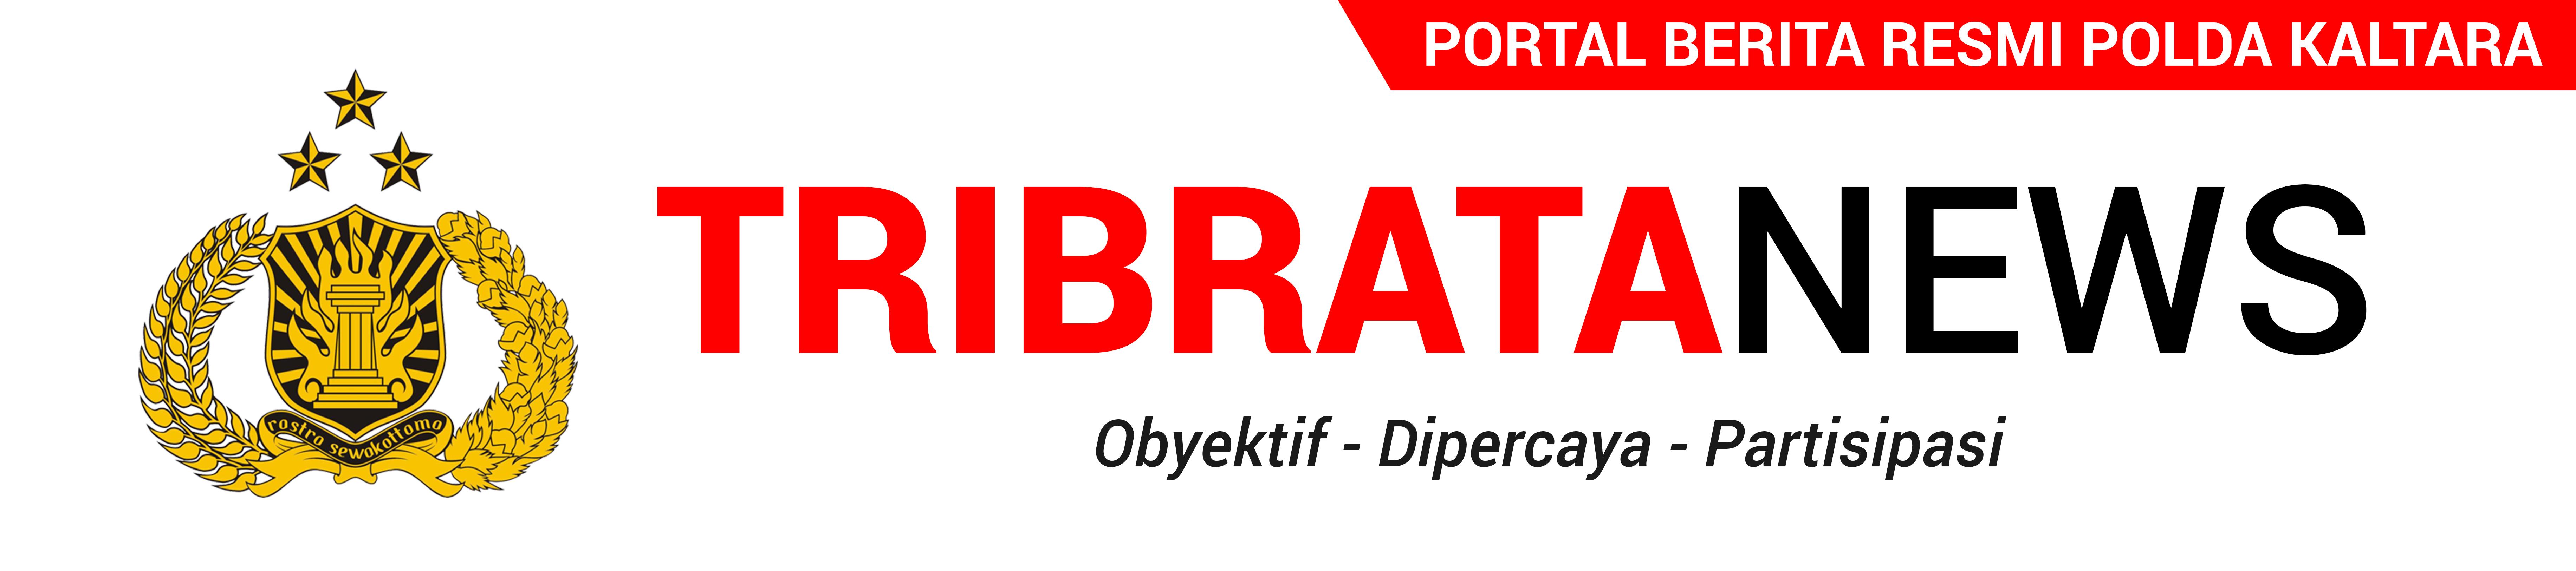 Tribratanews Polda Kaltara